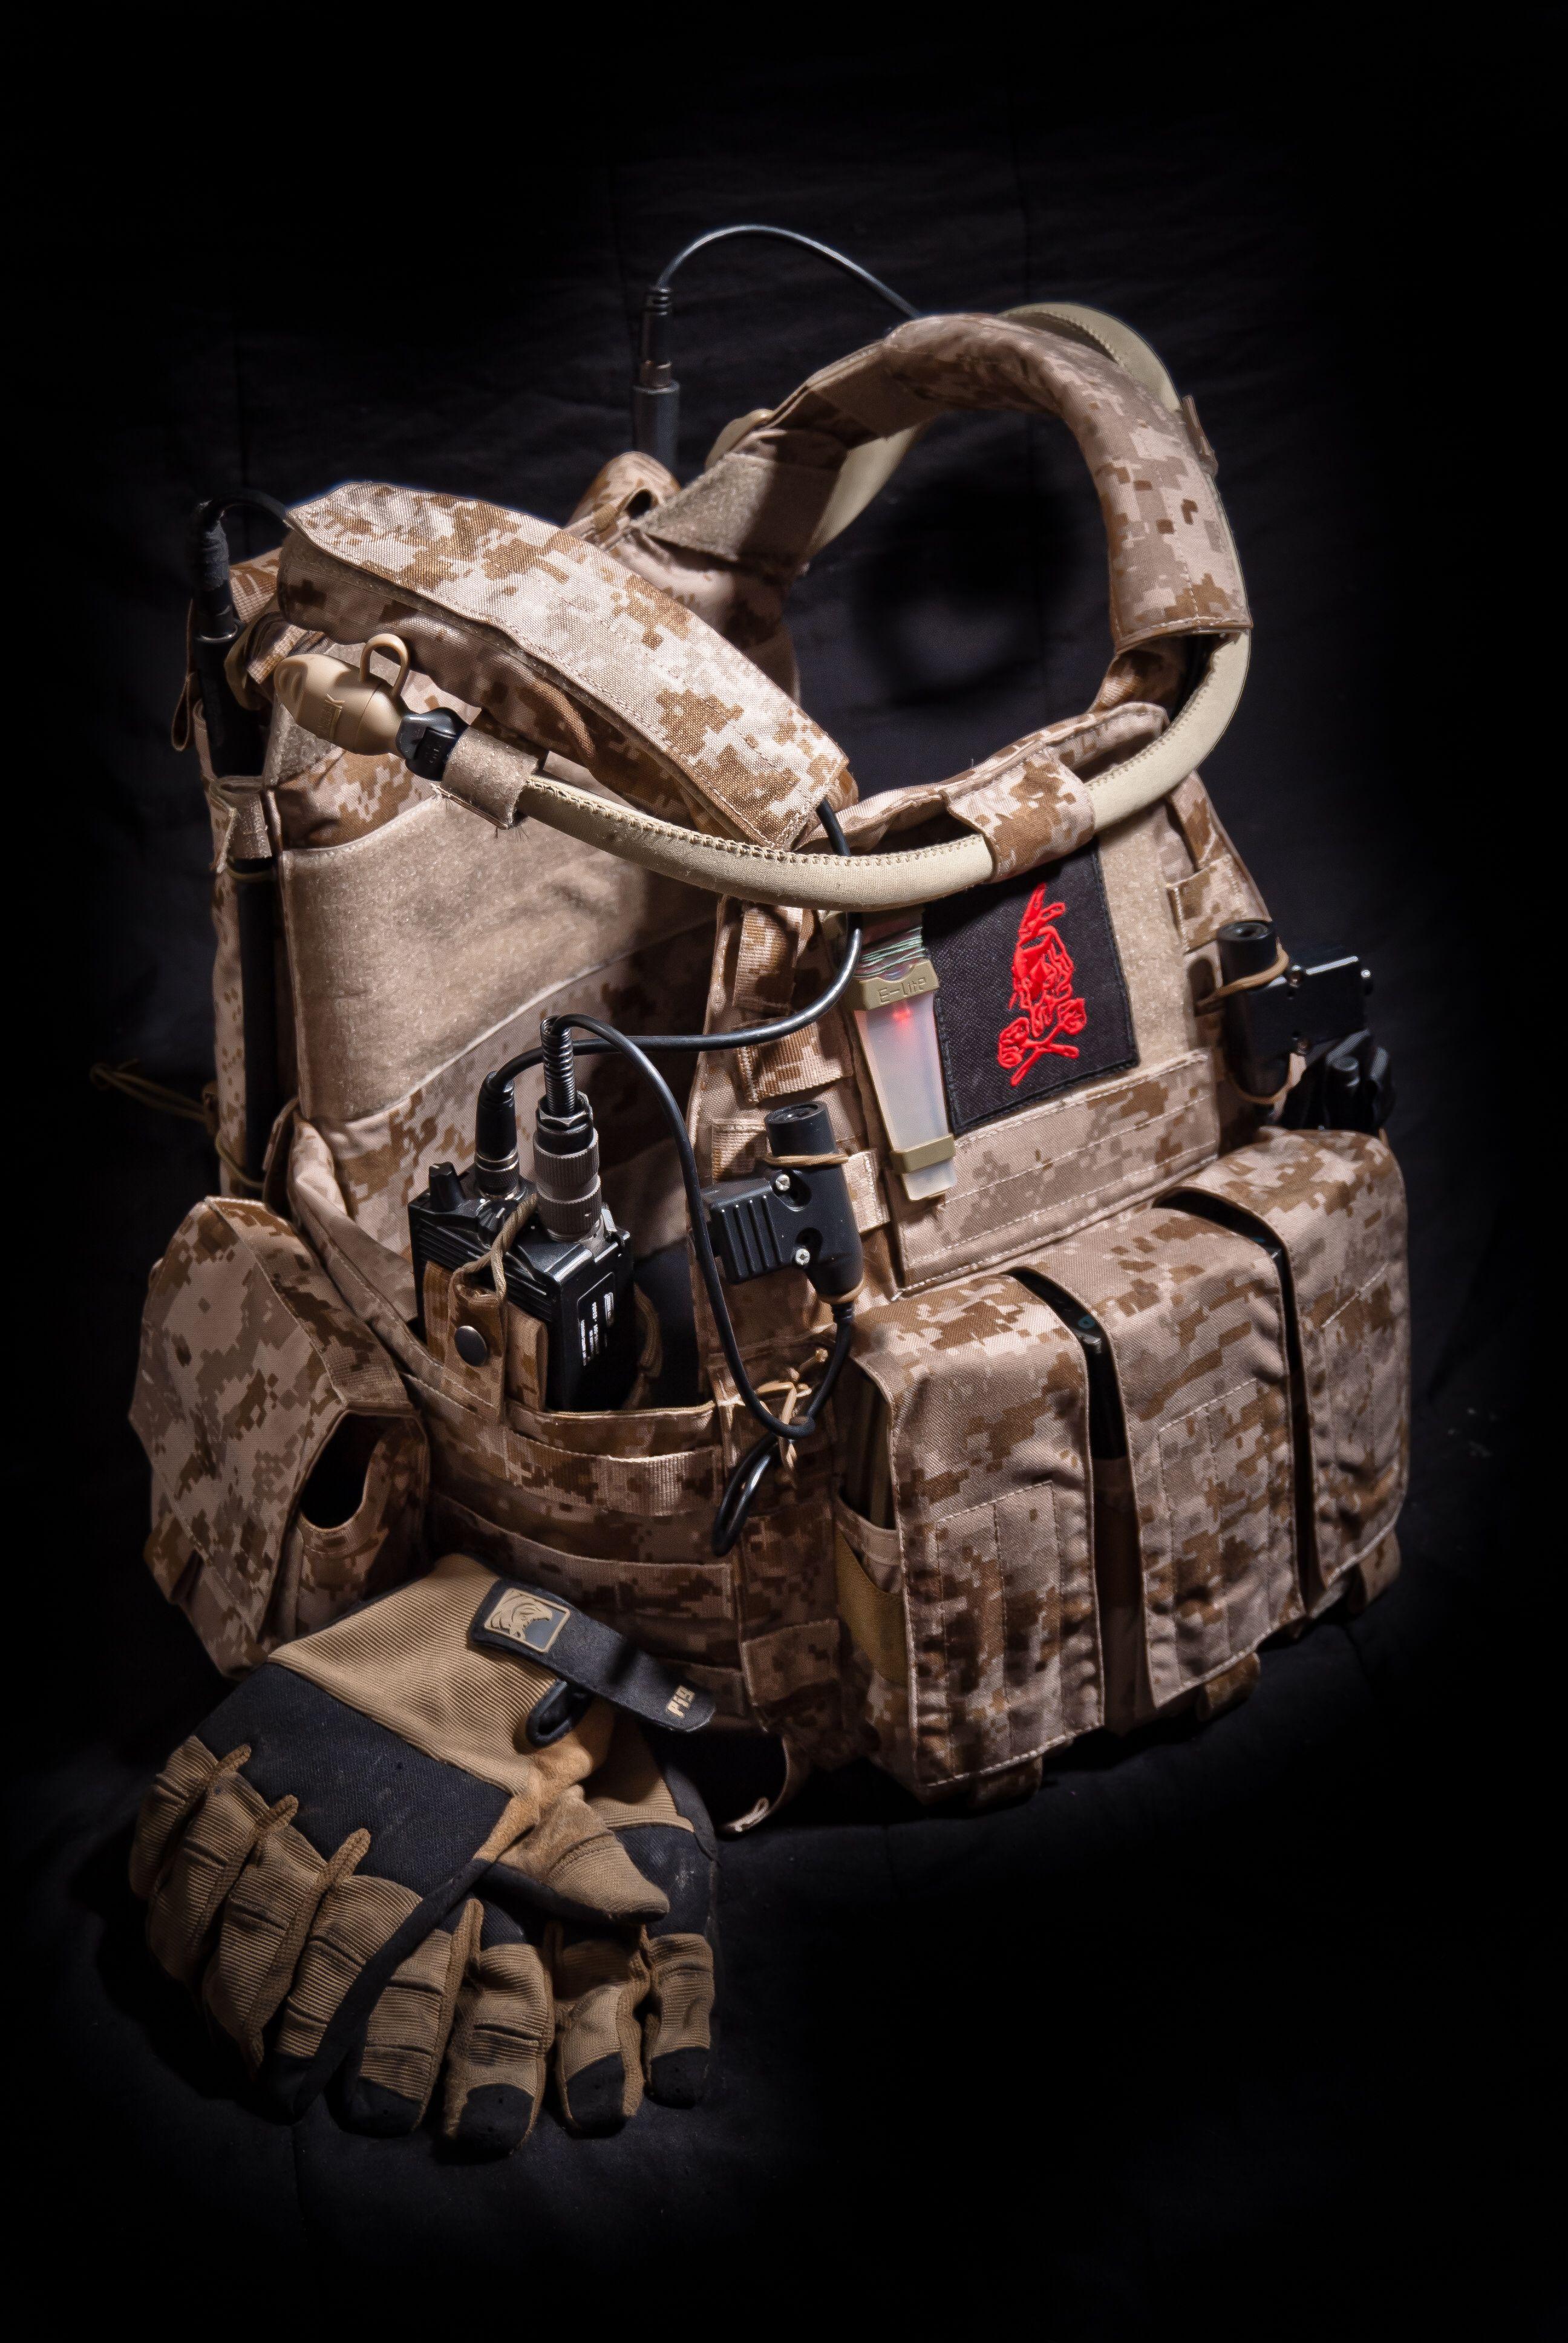 DEVGRU LOAD OUT - It's said that DEVGRU utilizes USMC E5 ...